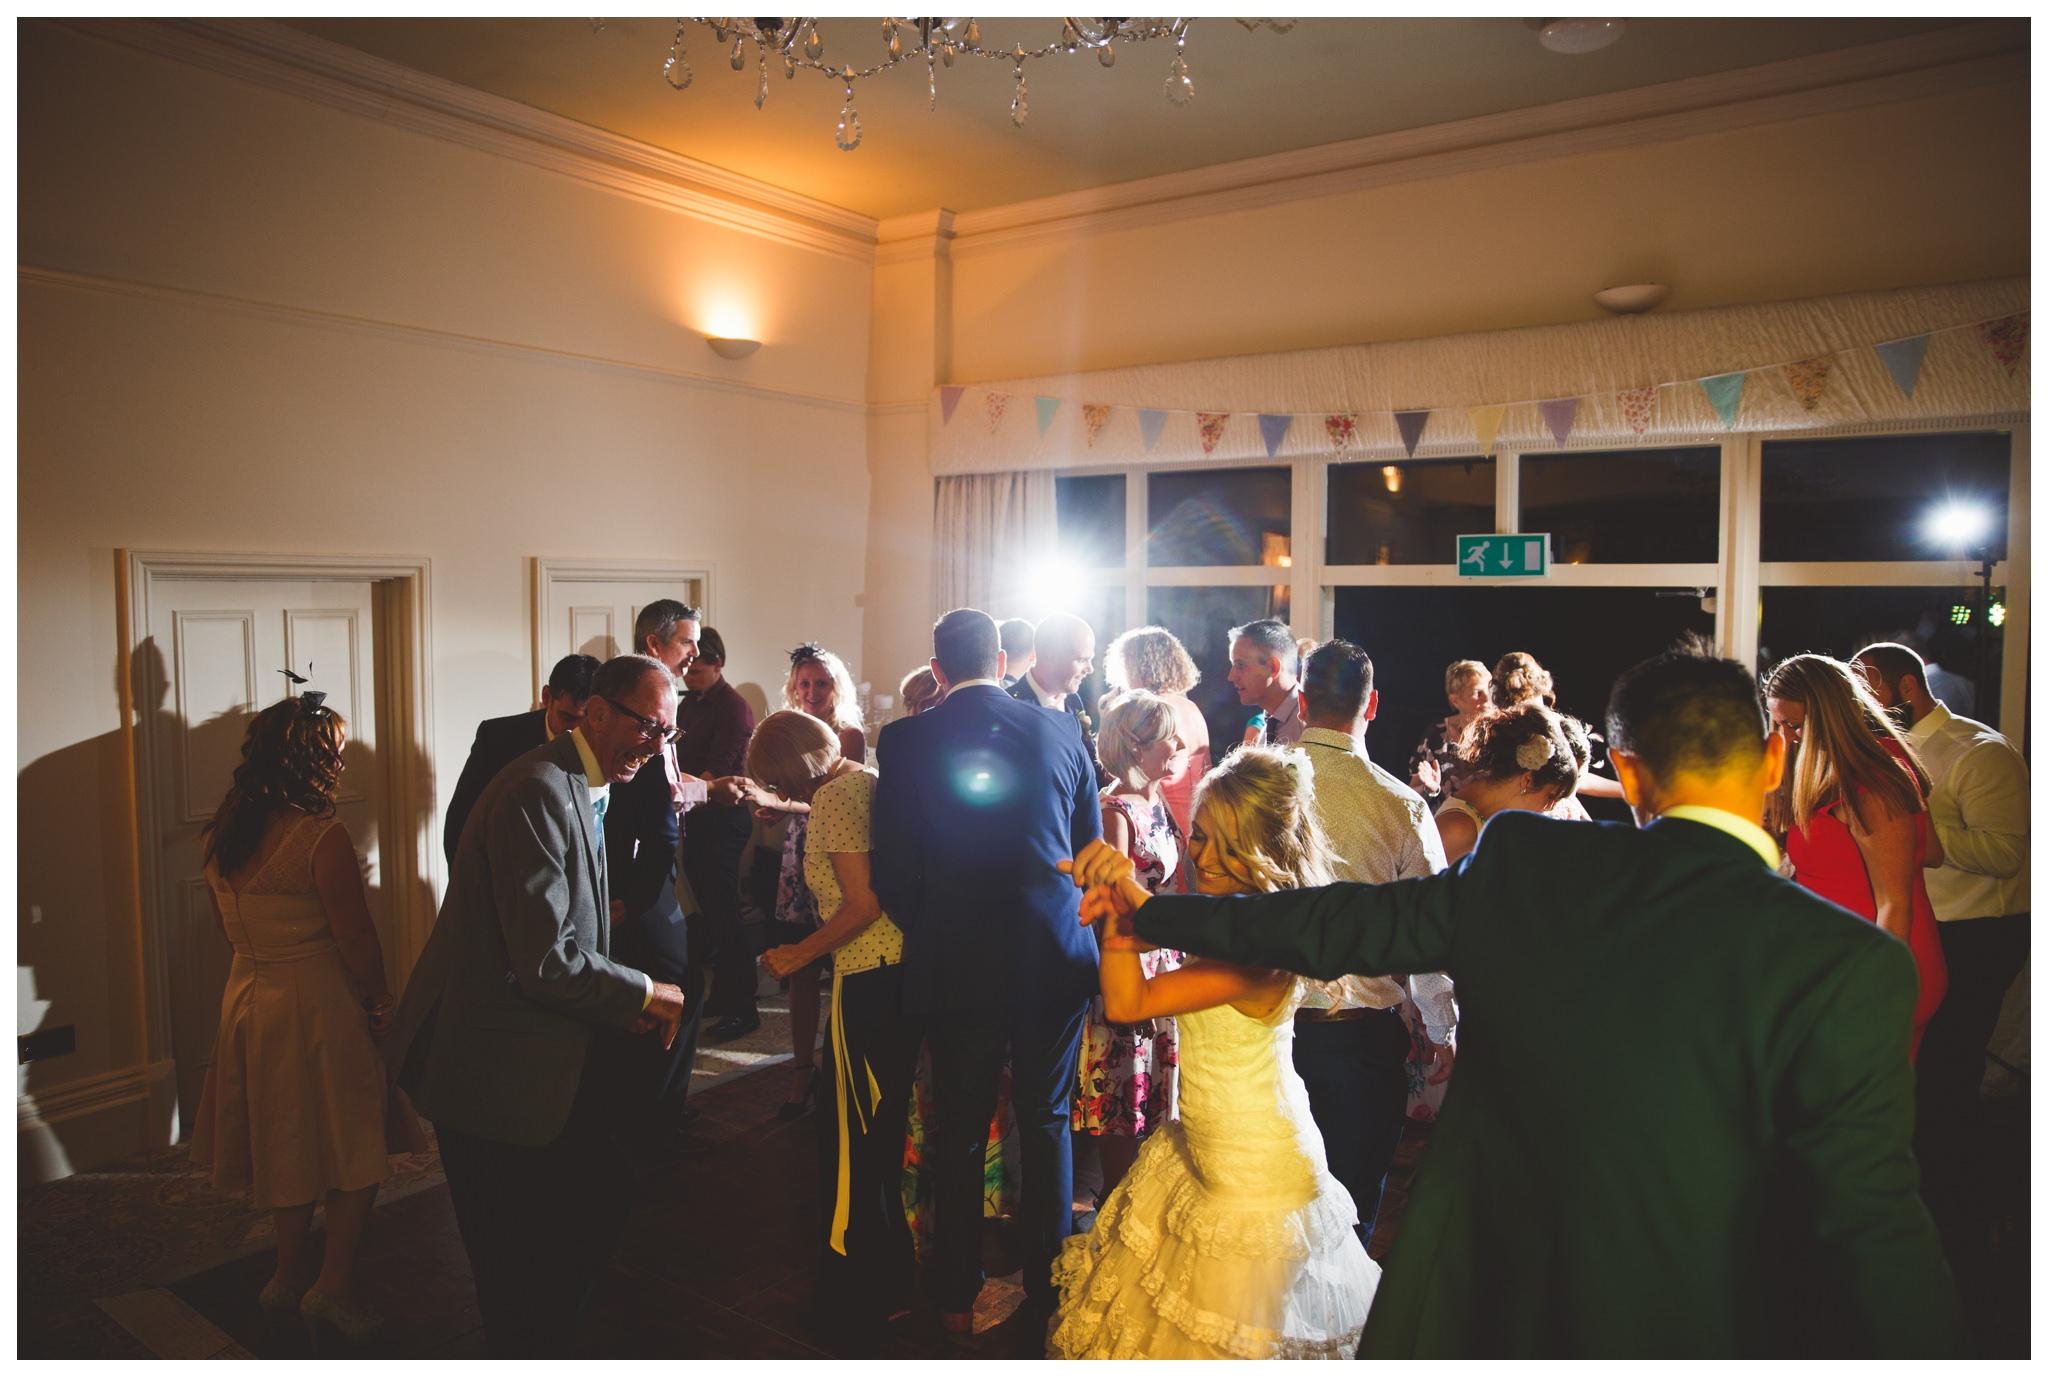 Richard Savage Photography - Wedding - Peterstone Court Brecon - 2016-05-11_0064